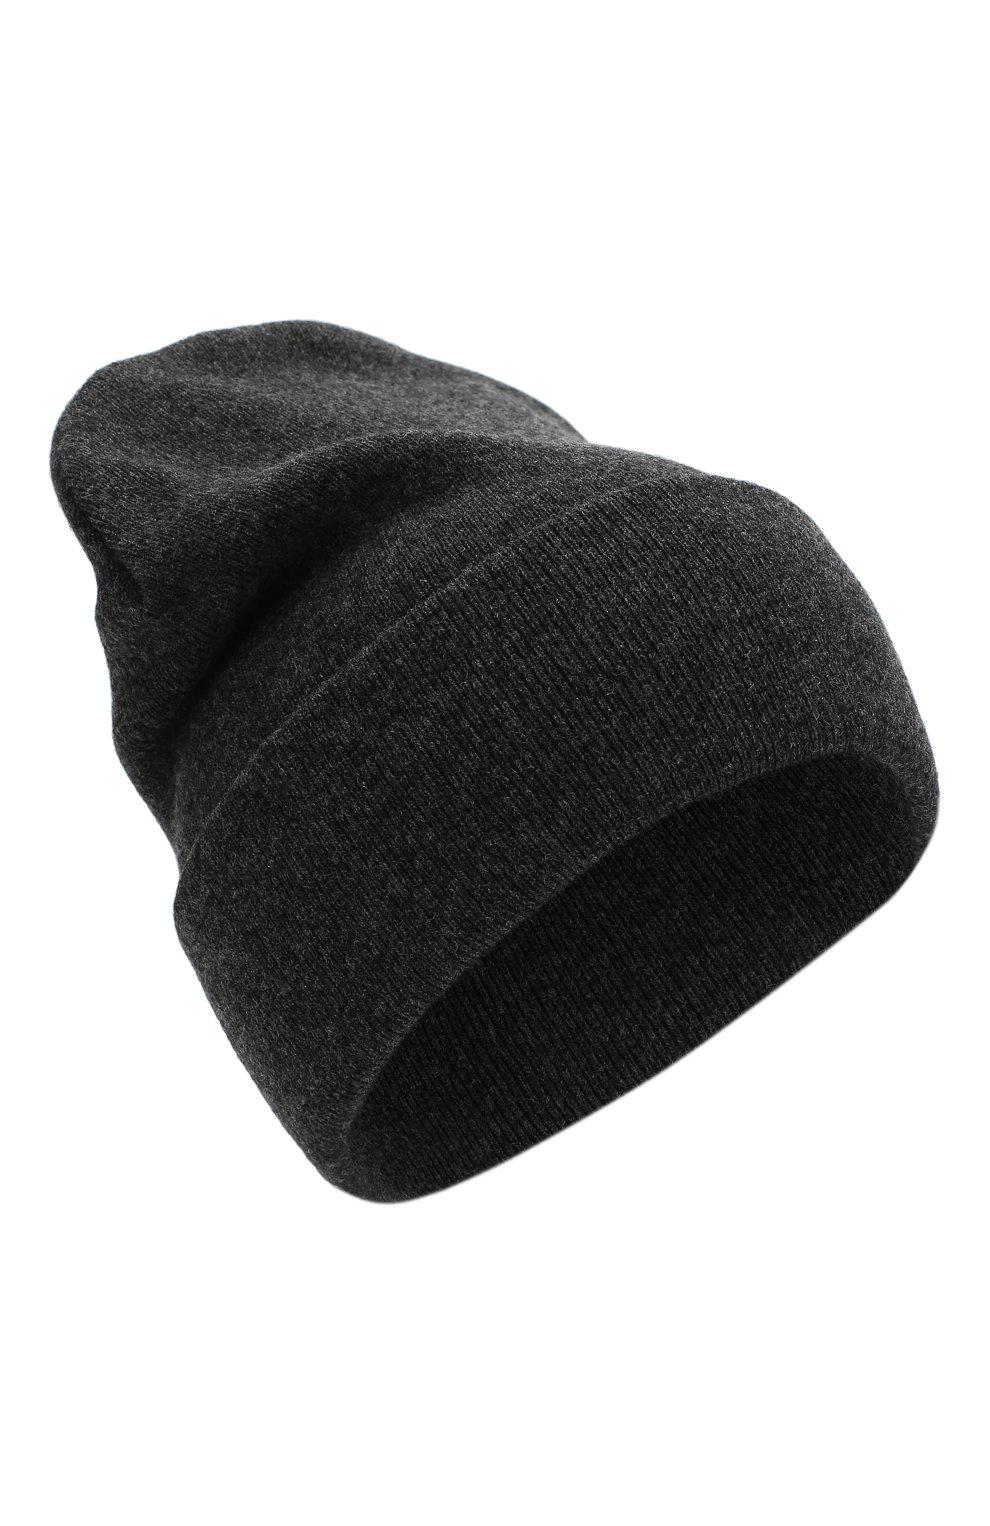 Детского шапка из шерсти и кашемира IL TRENINO темно-серого цвета, арт. 19 6408/LR | Фото 1